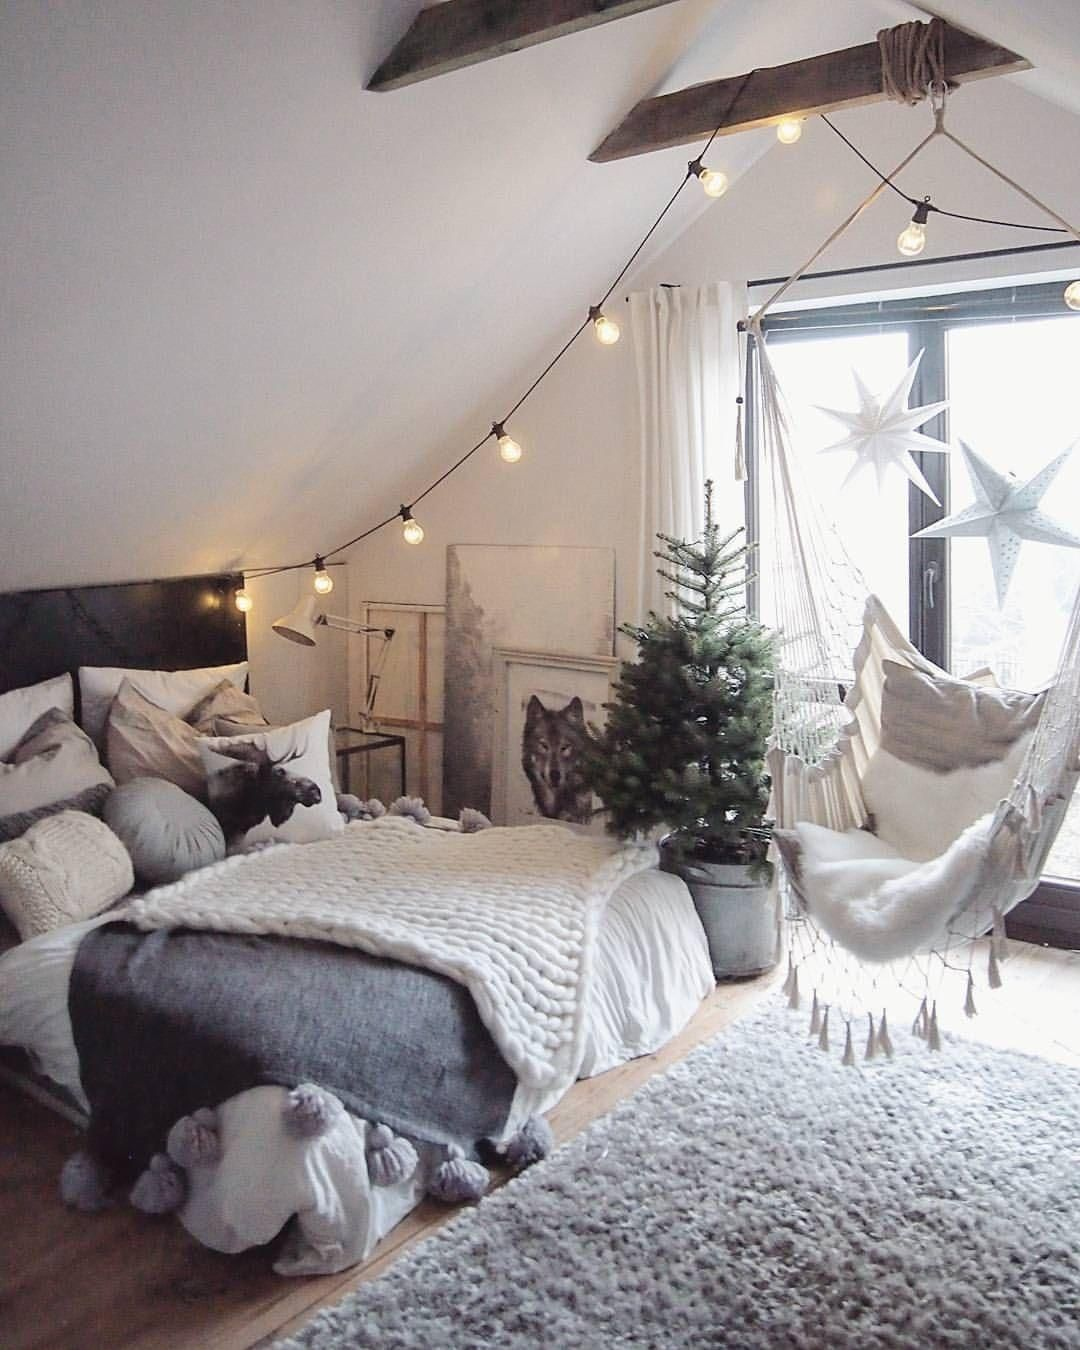 16 Deco Chambre Ado Fille Bedroom Decor Cozy Bedroom Ideas Pinterest Small Room Bedroom